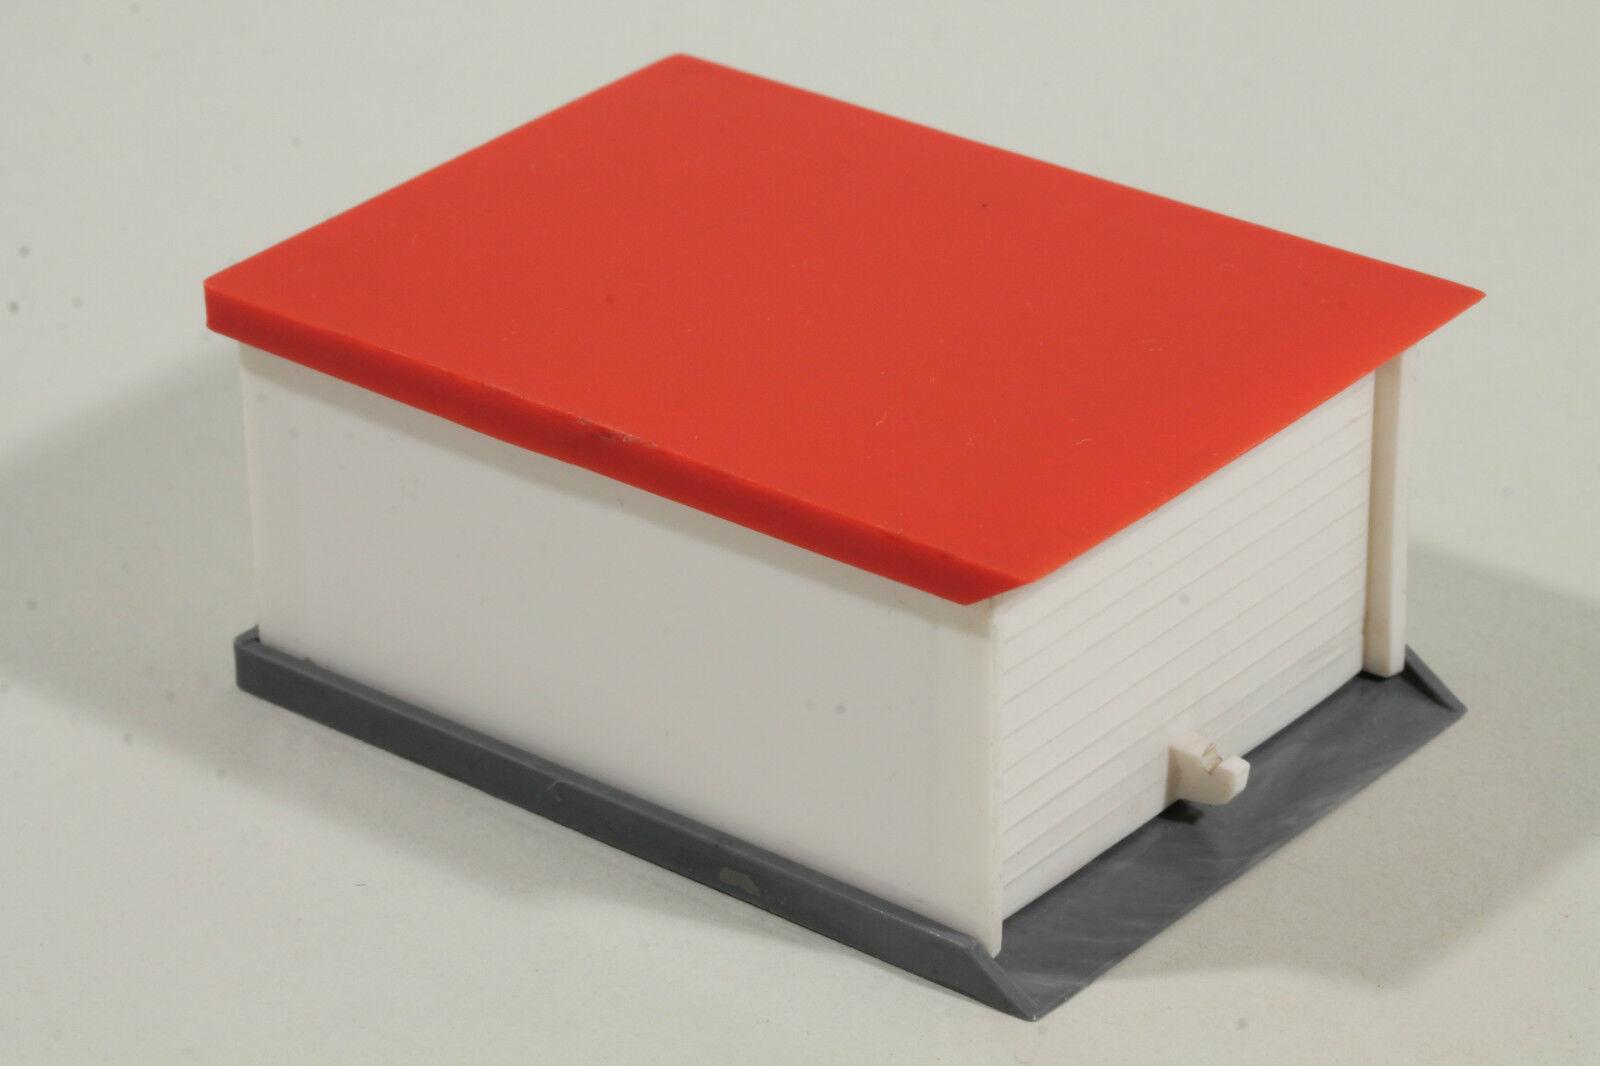 1288 tipo 1j Wiking turismos-garaje 1950 - 1972 blancoo & rojo